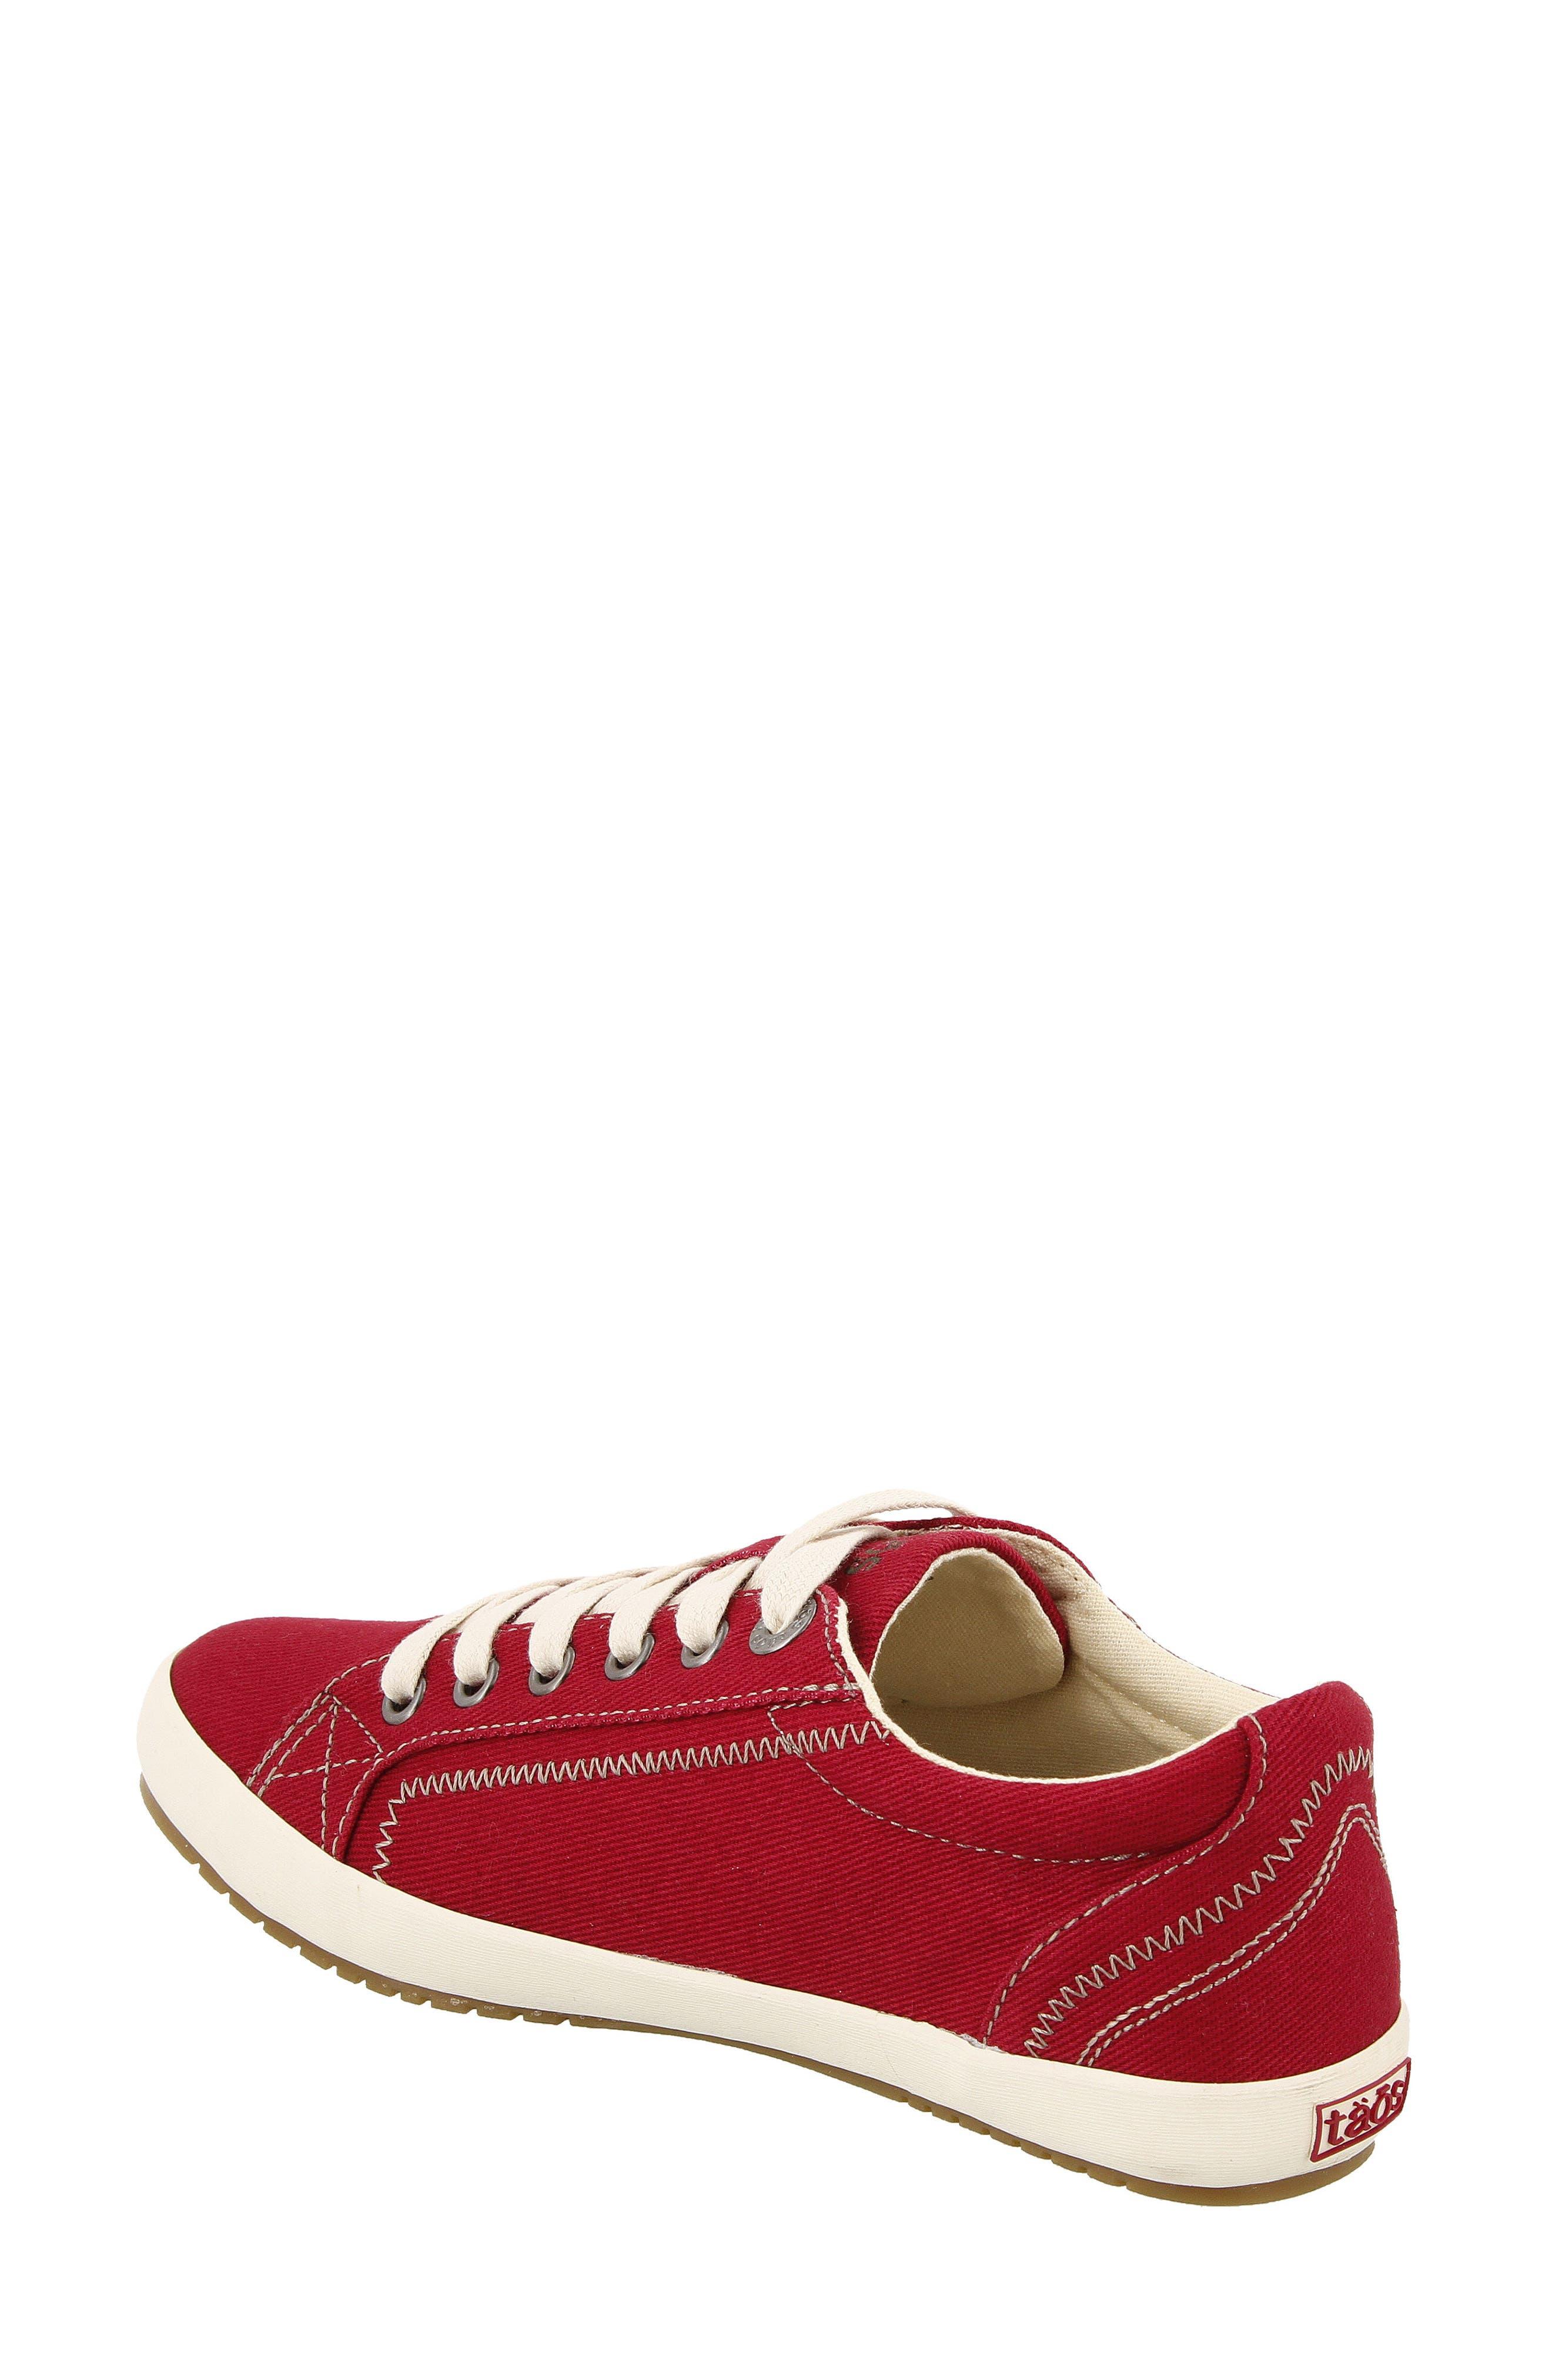 Alternate Image 2  - Taos 'Star' Sneaker (Women)